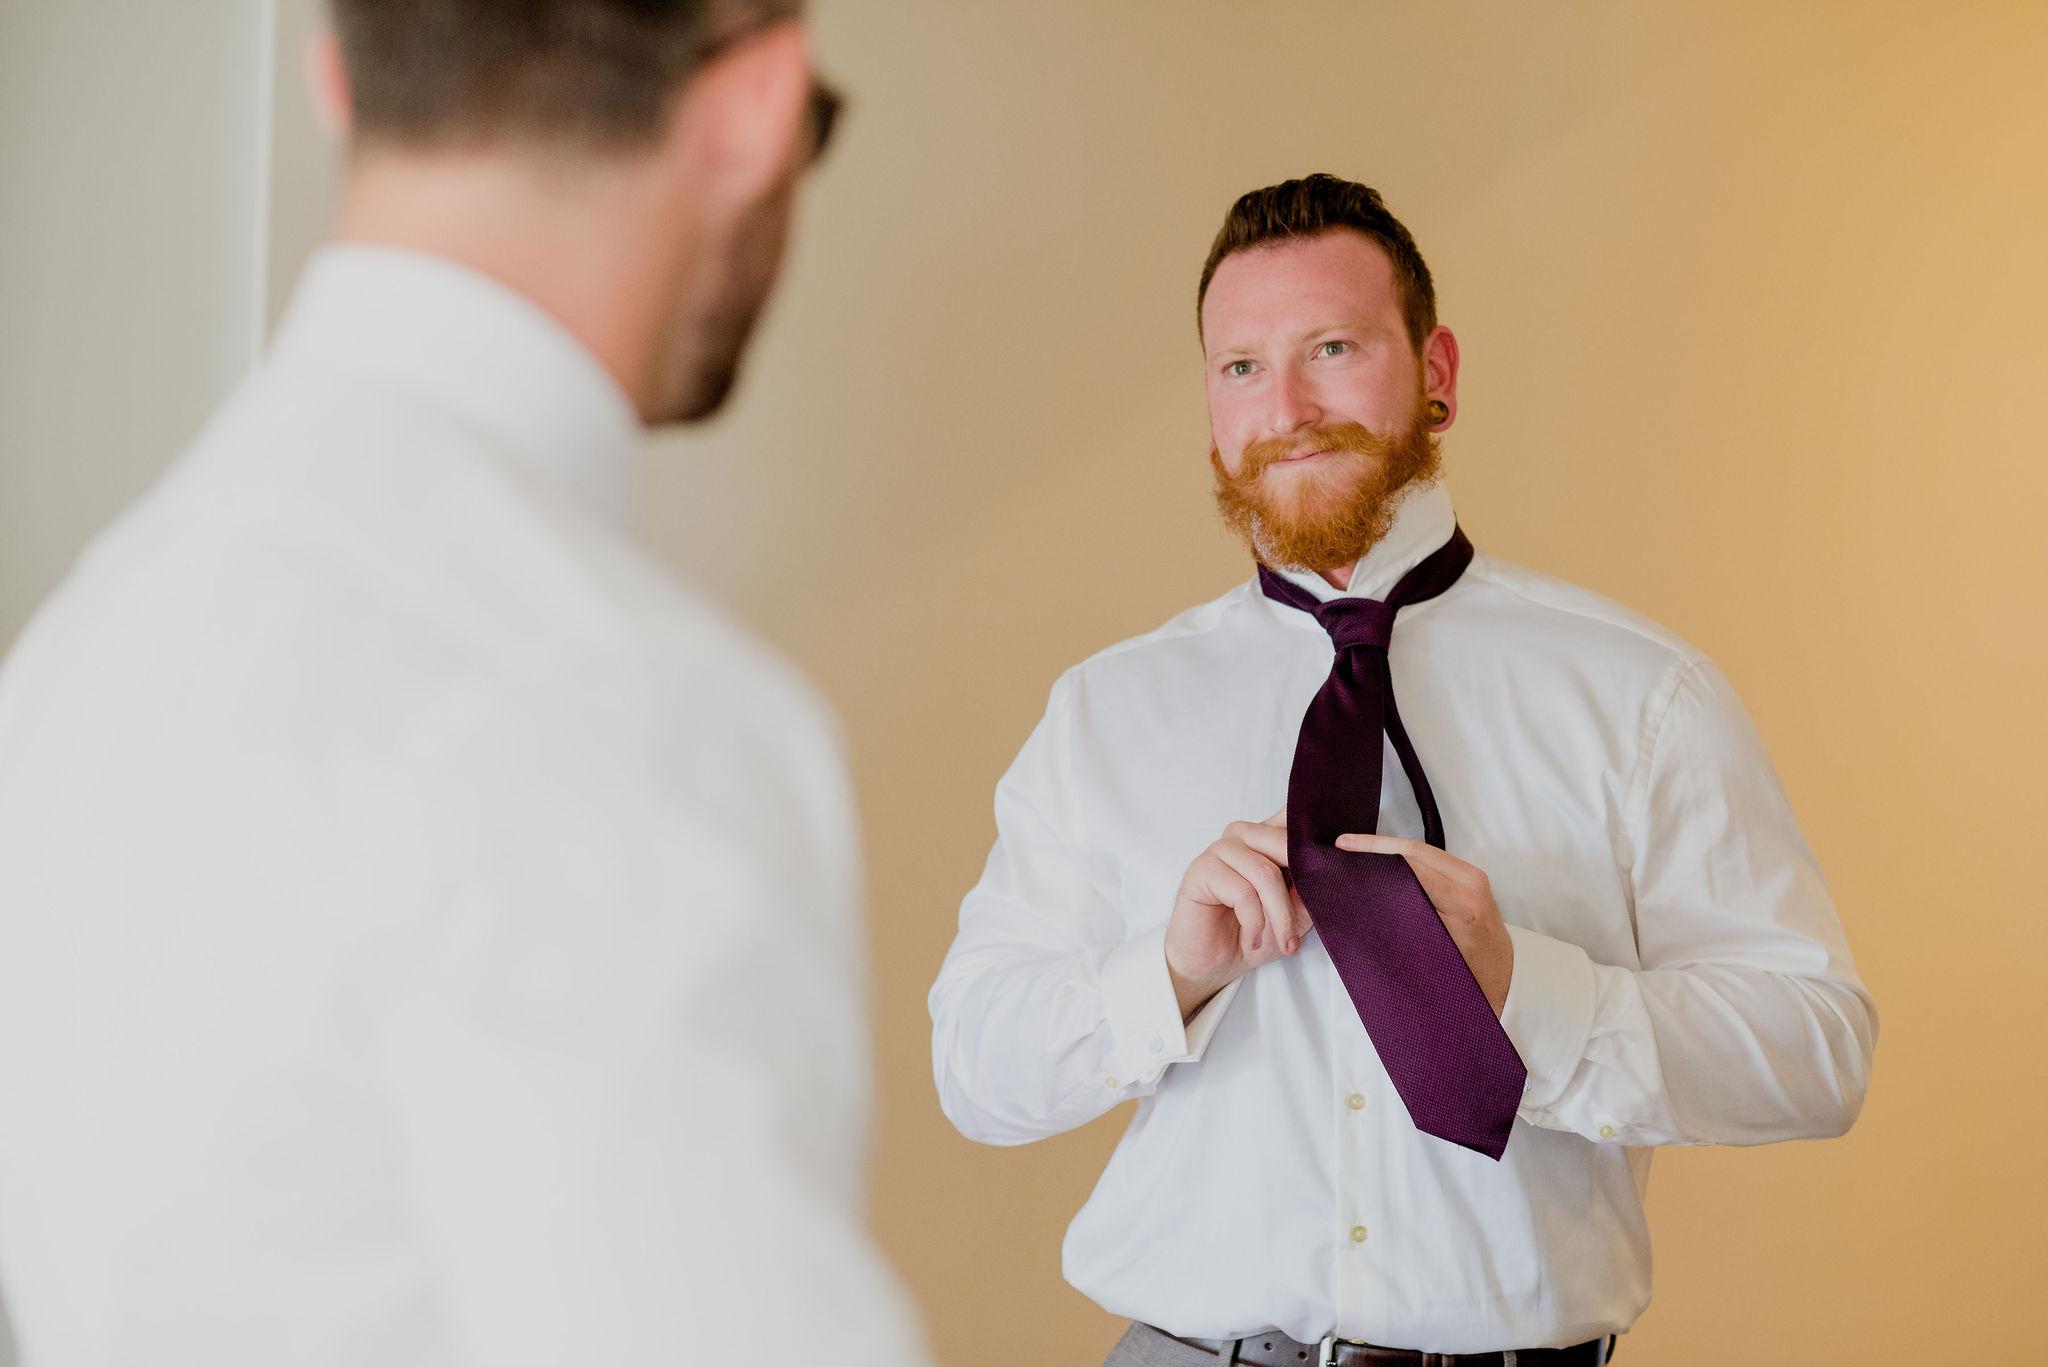 Bearded man tying his purple tie